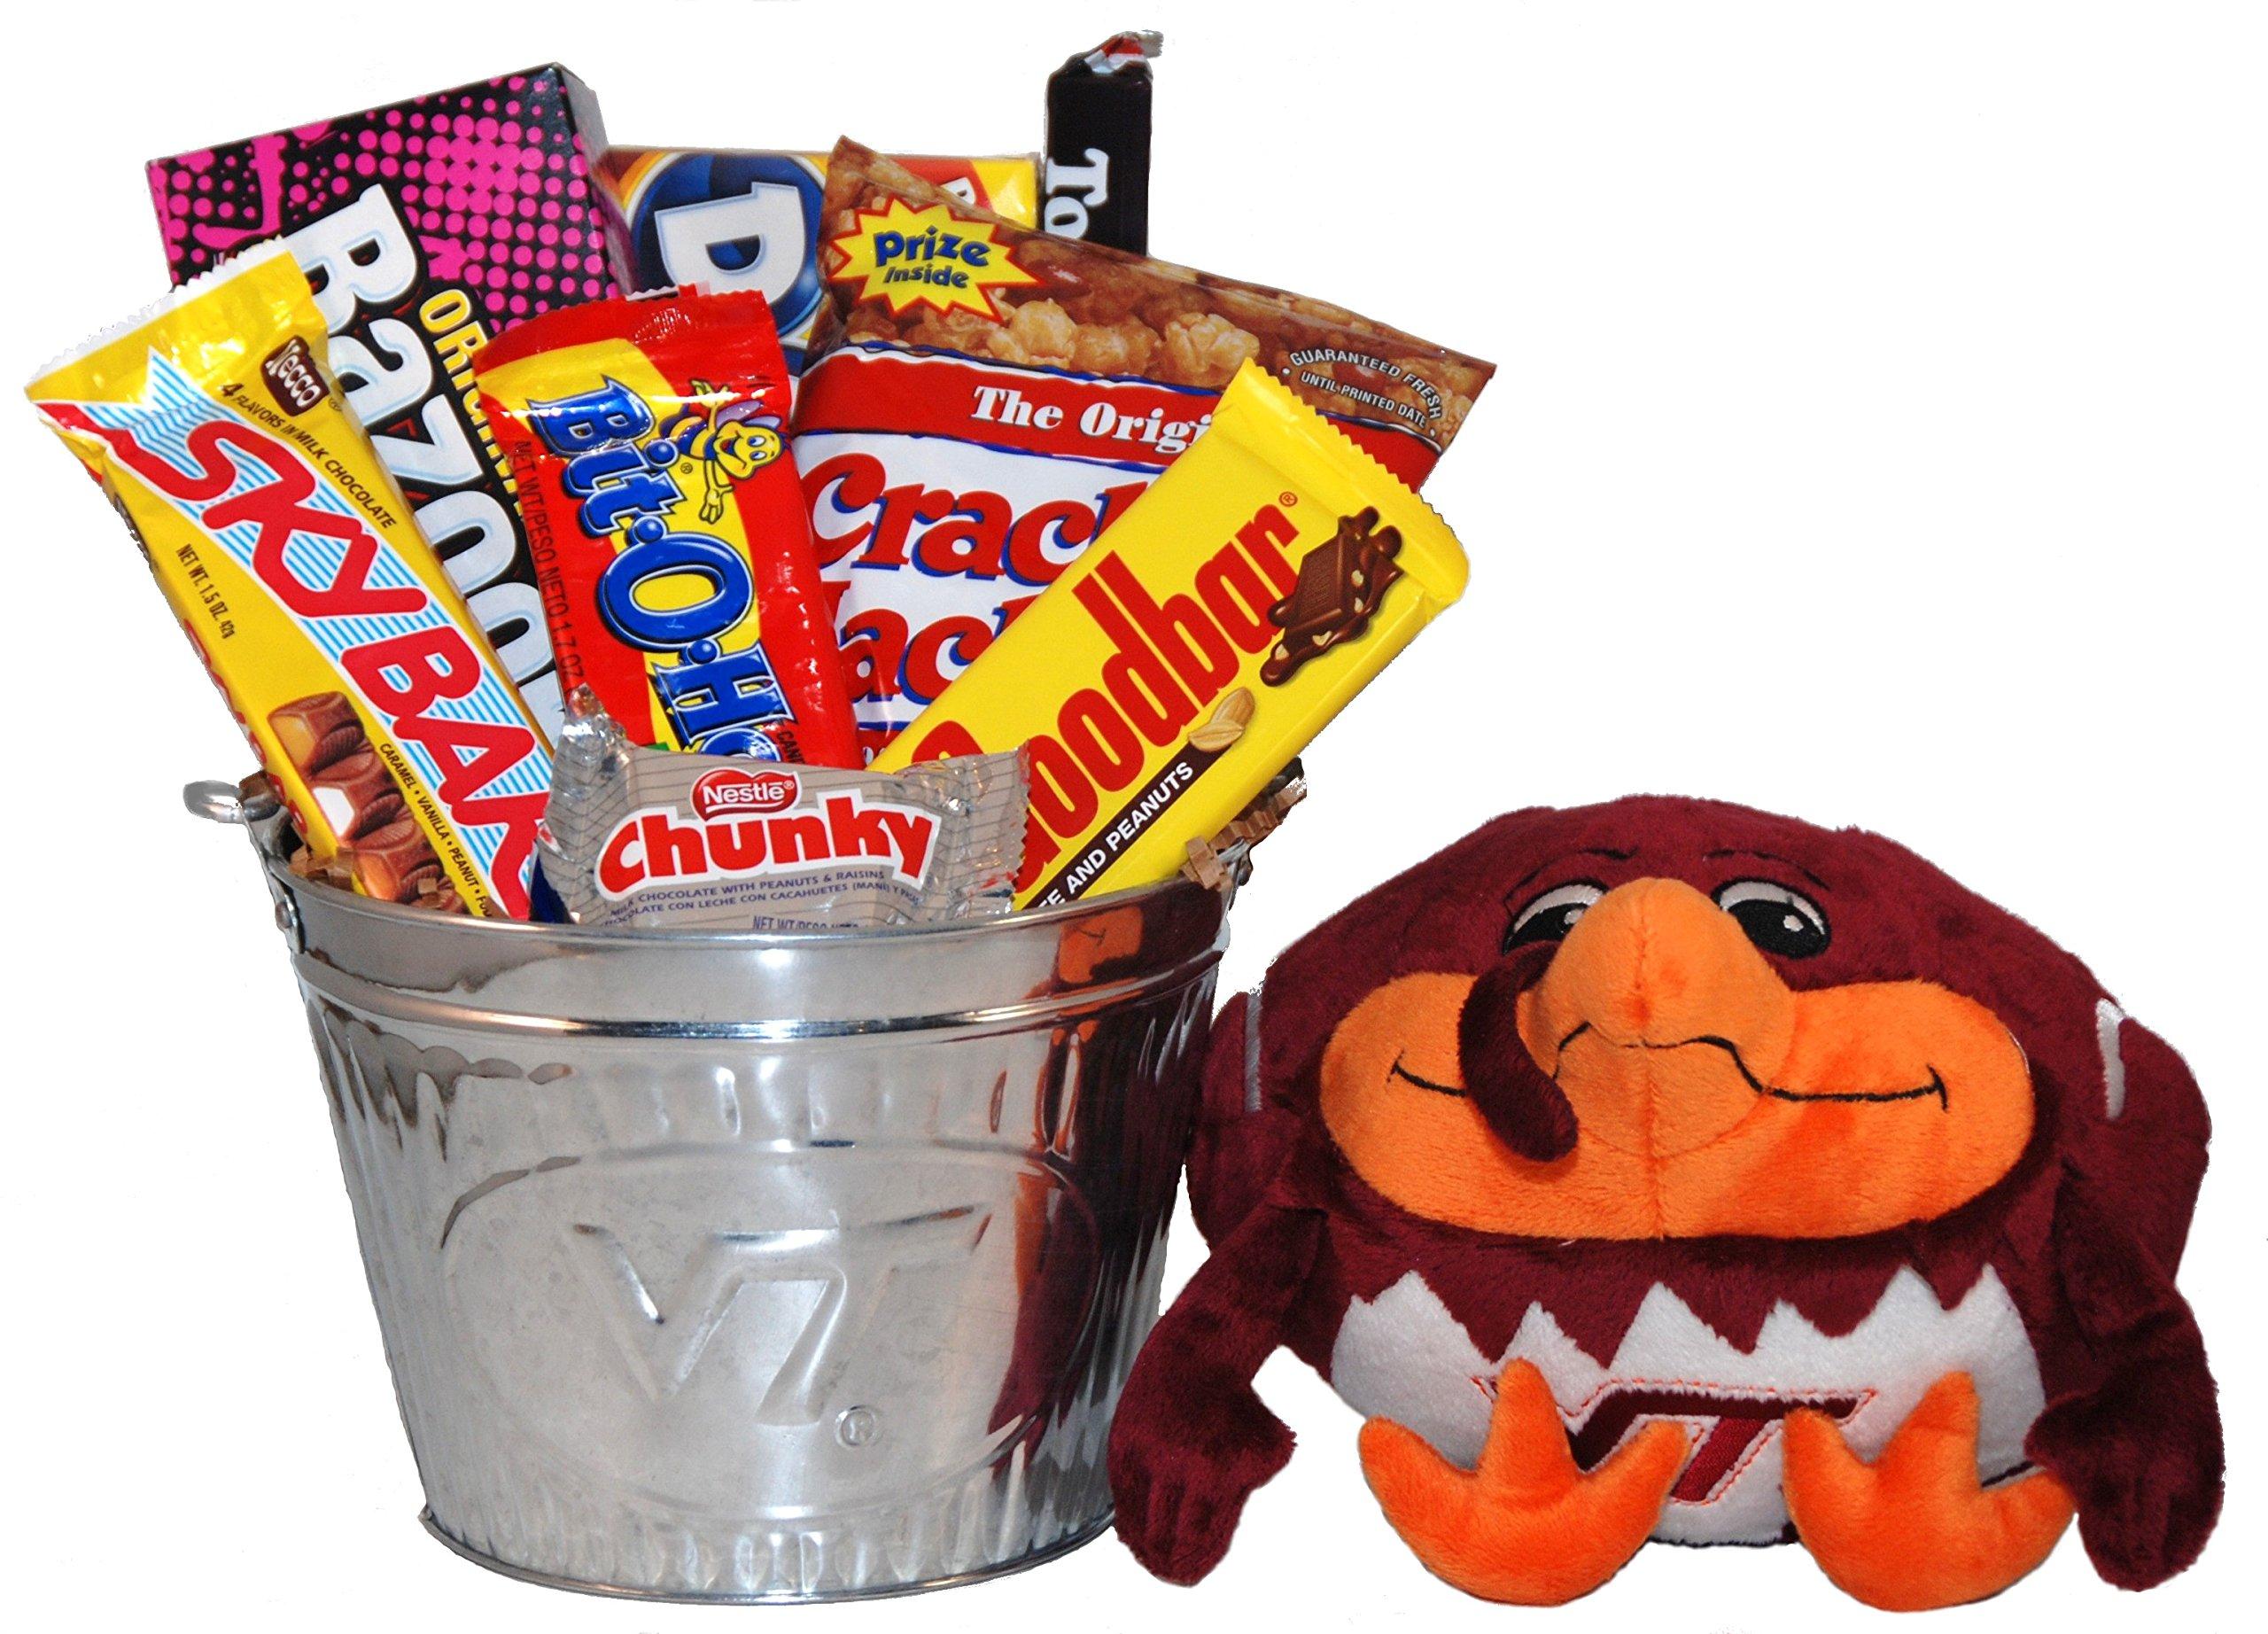 Virginia Tech Snack Bucket Gift Basket - Large